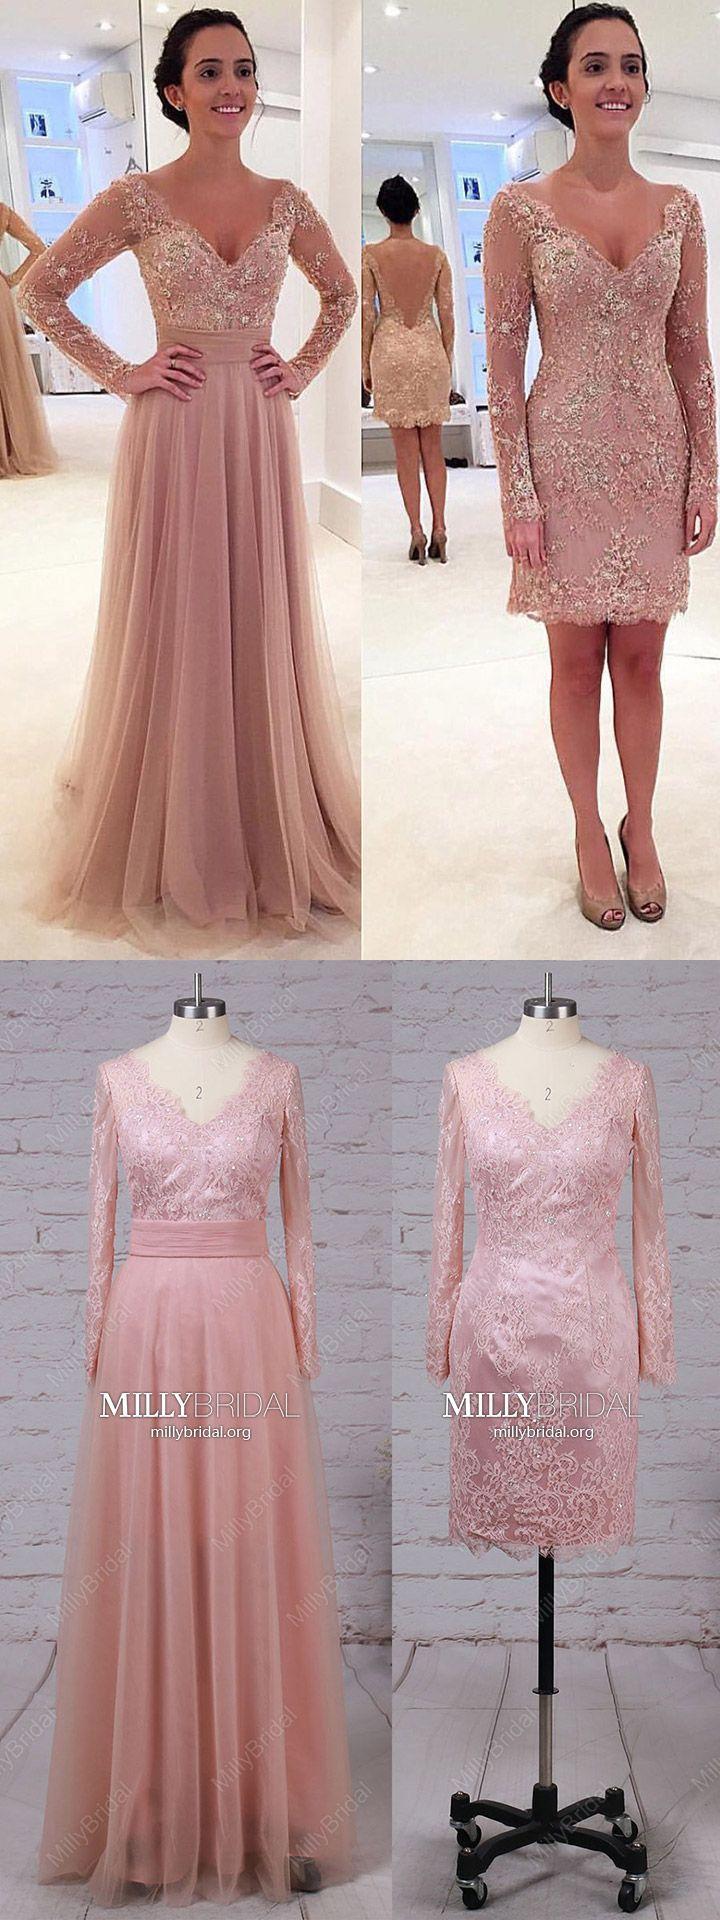 Long prom dresses for teenslong sleeve formal evening dresses